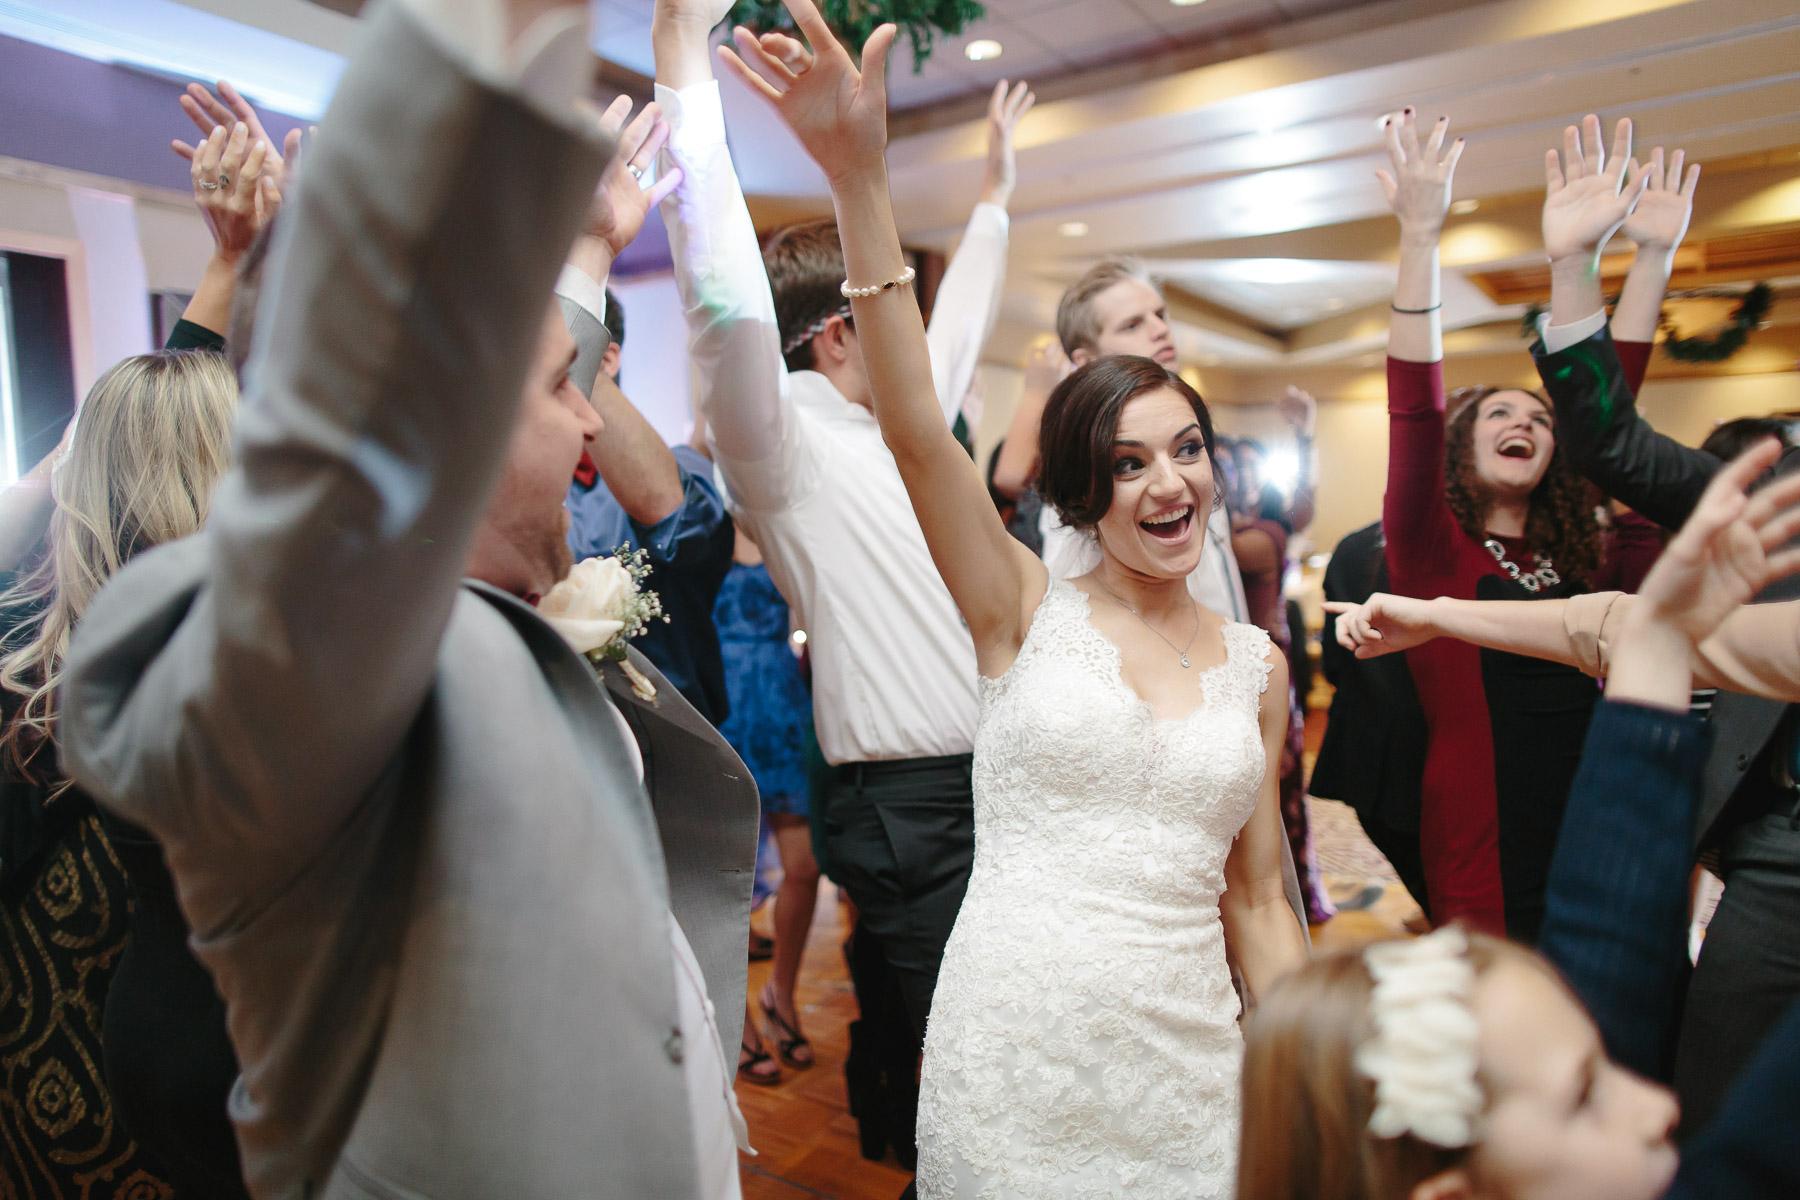 161210-Luxium-Weddings-Arizona-Matt-Jenny-Anthem-Golf-Country-Club-1067.jpg